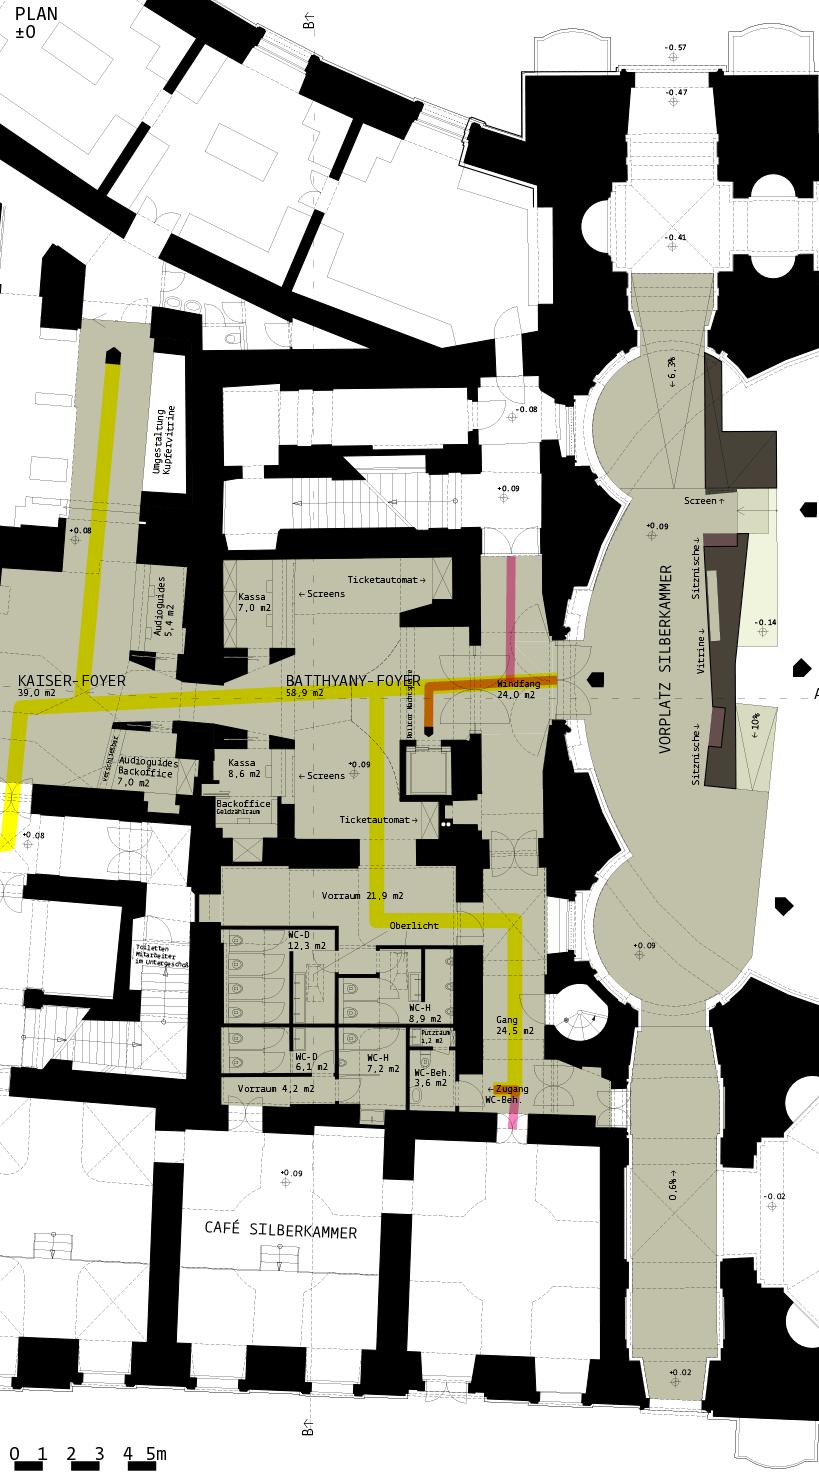 Silberkammer Hofburg: plan +-0